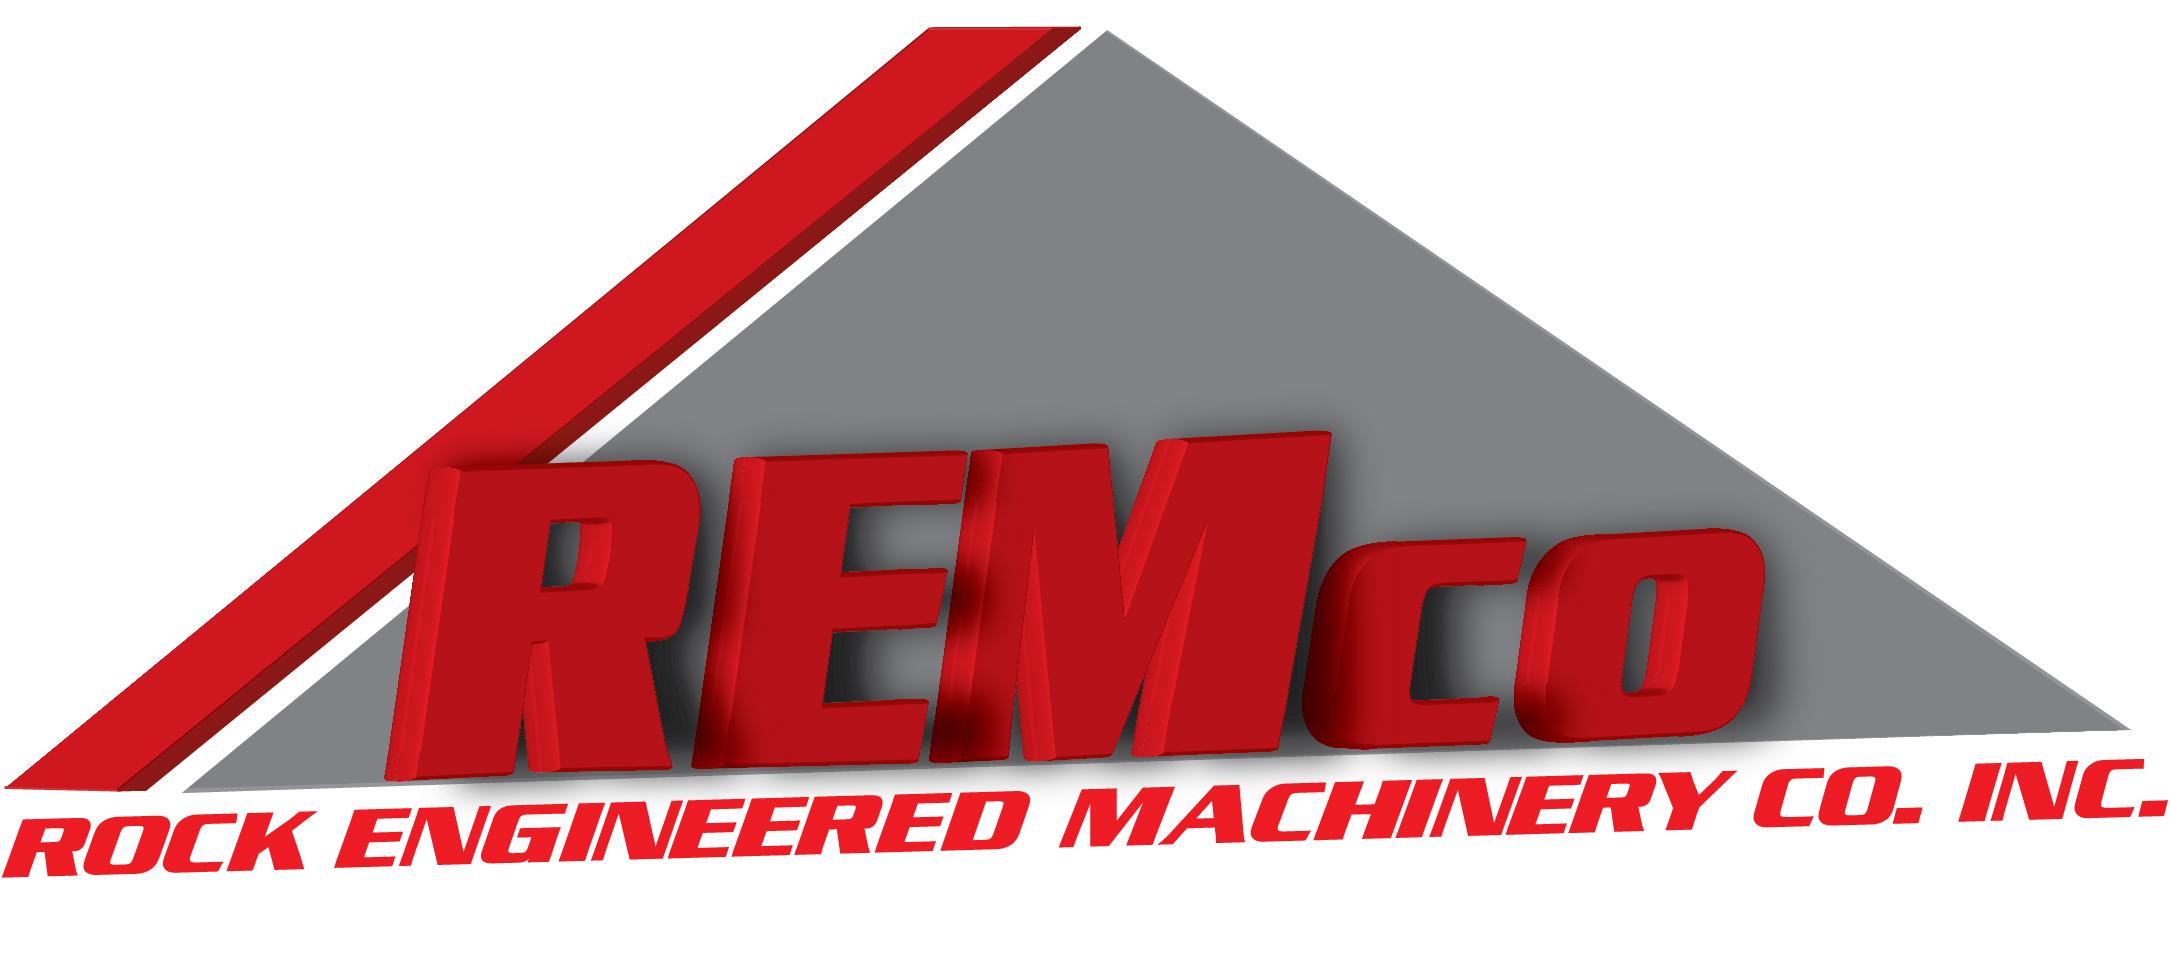 REMco company logo